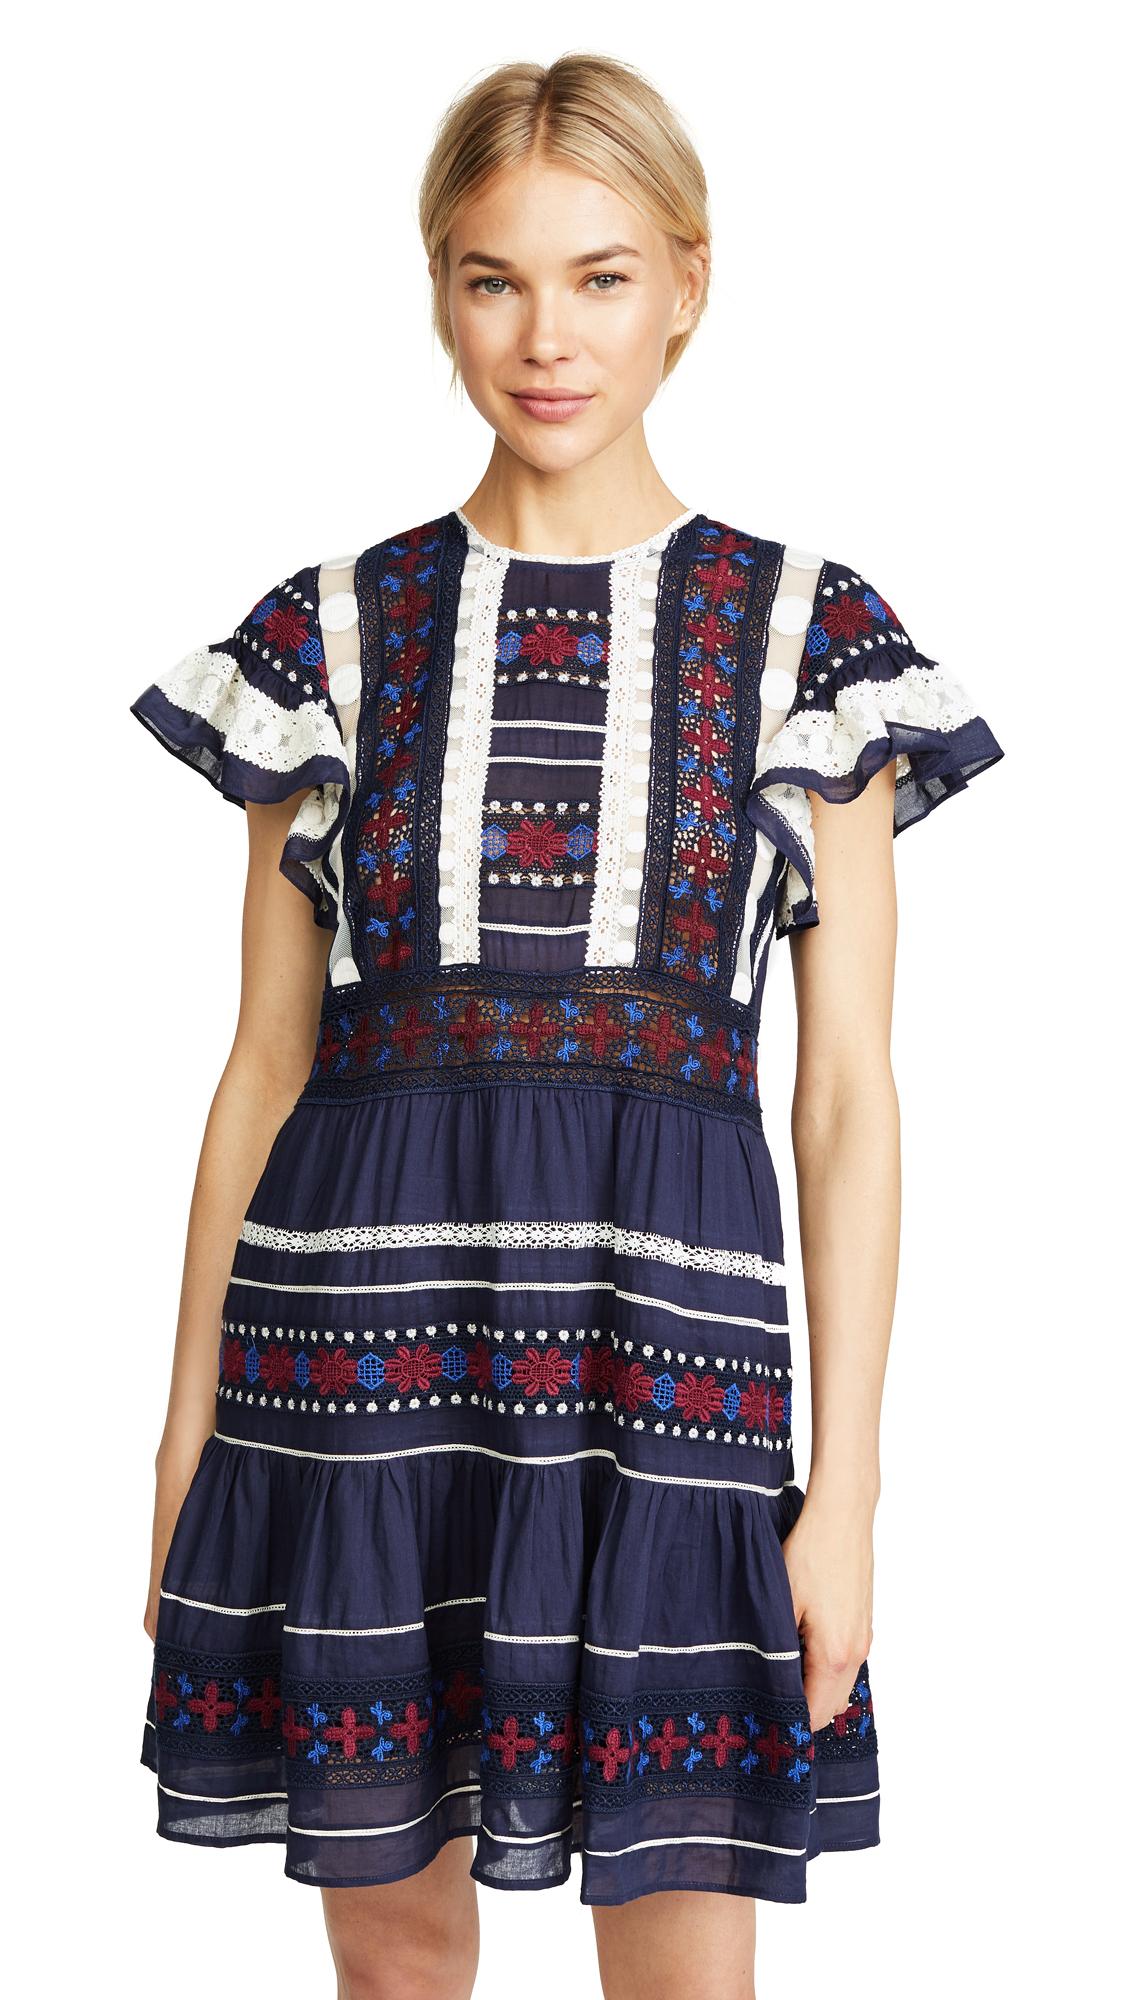 Sea Ila Lace Dress In Blue/Multi